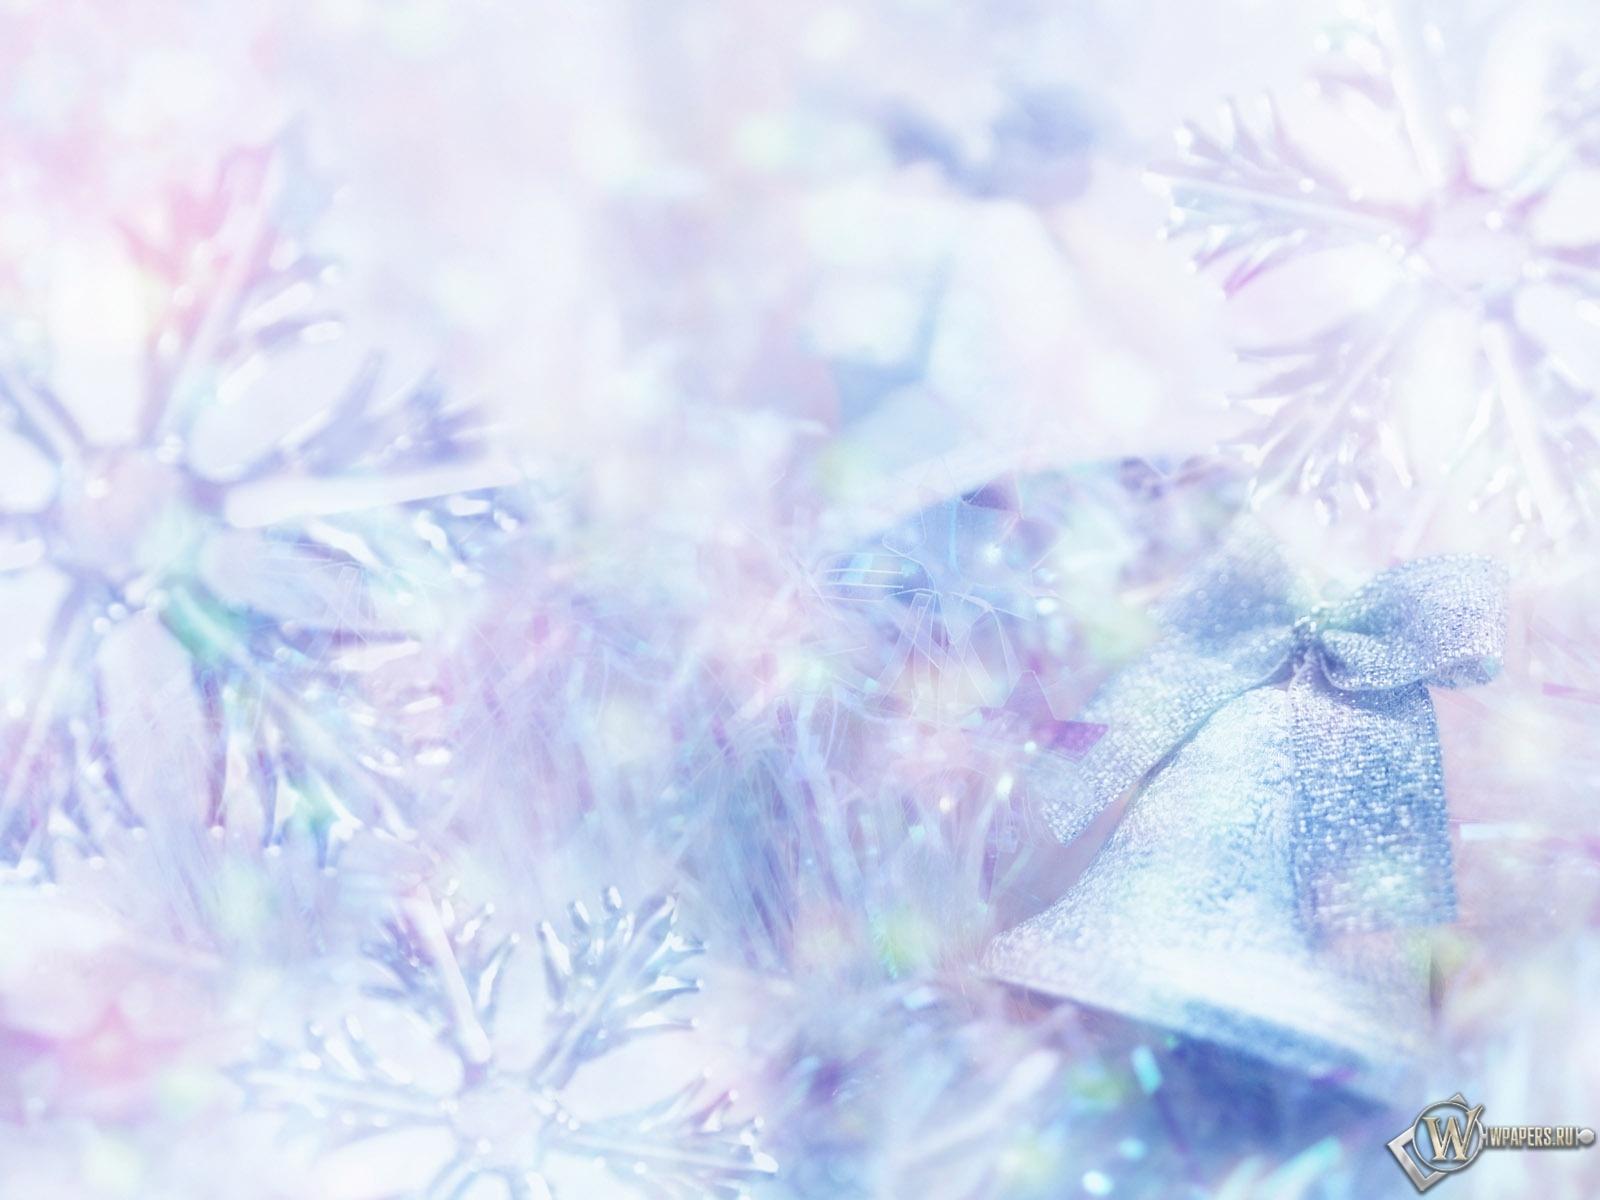 Снежинки и колокольчики 1600x1200